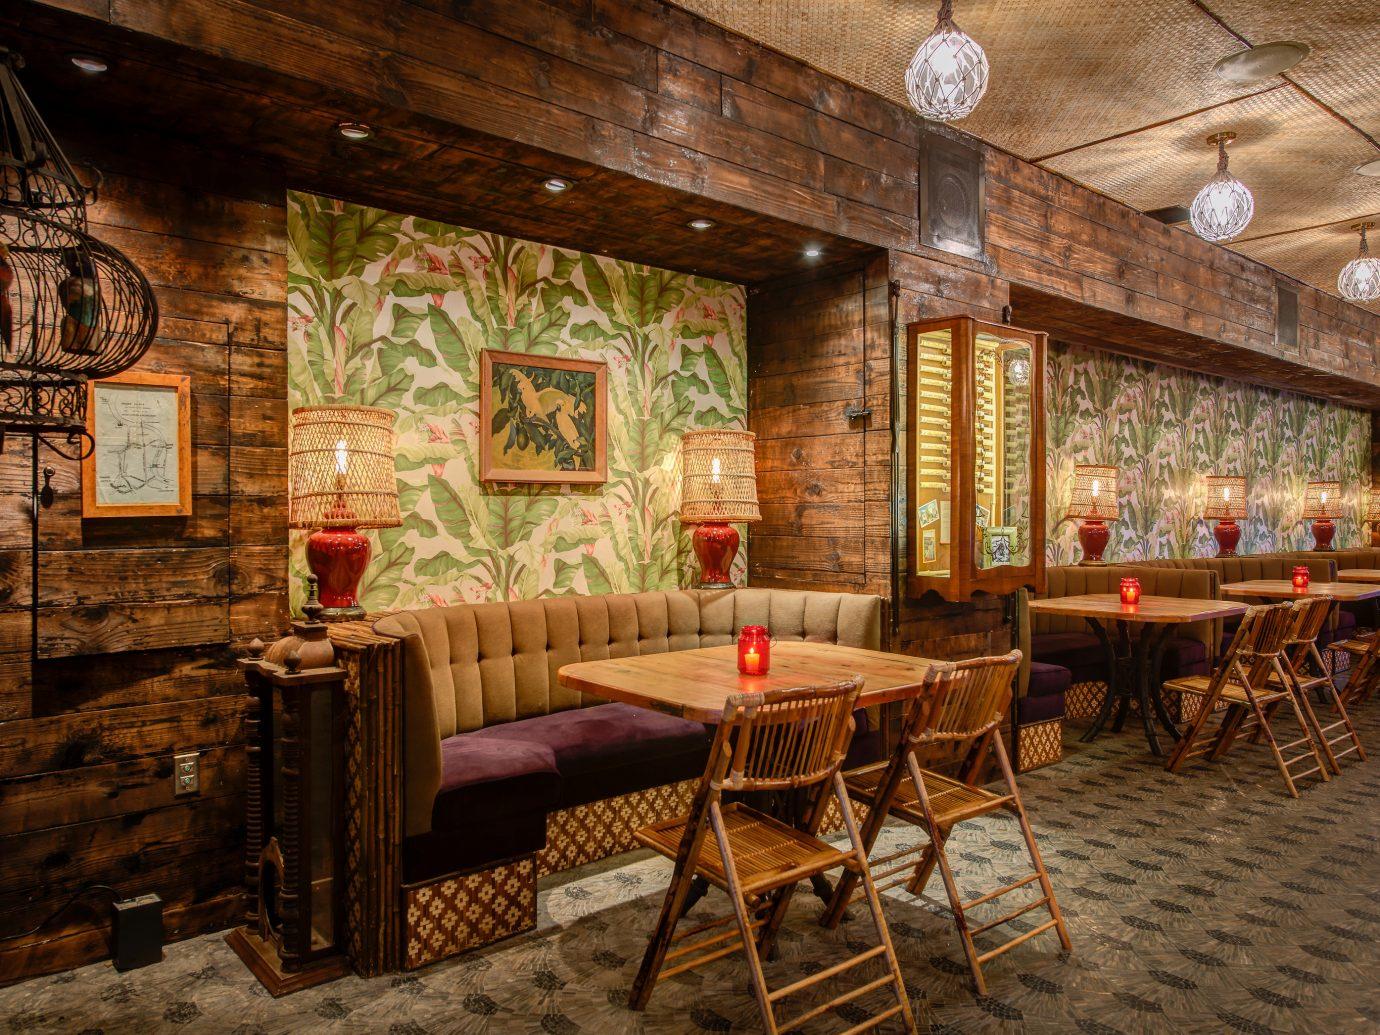 Arts + Culture Hotels Jetsetter Guides shopping Travel Trends Trip Ideas indoor ceiling interior design restaurant tavern table flooring furniture